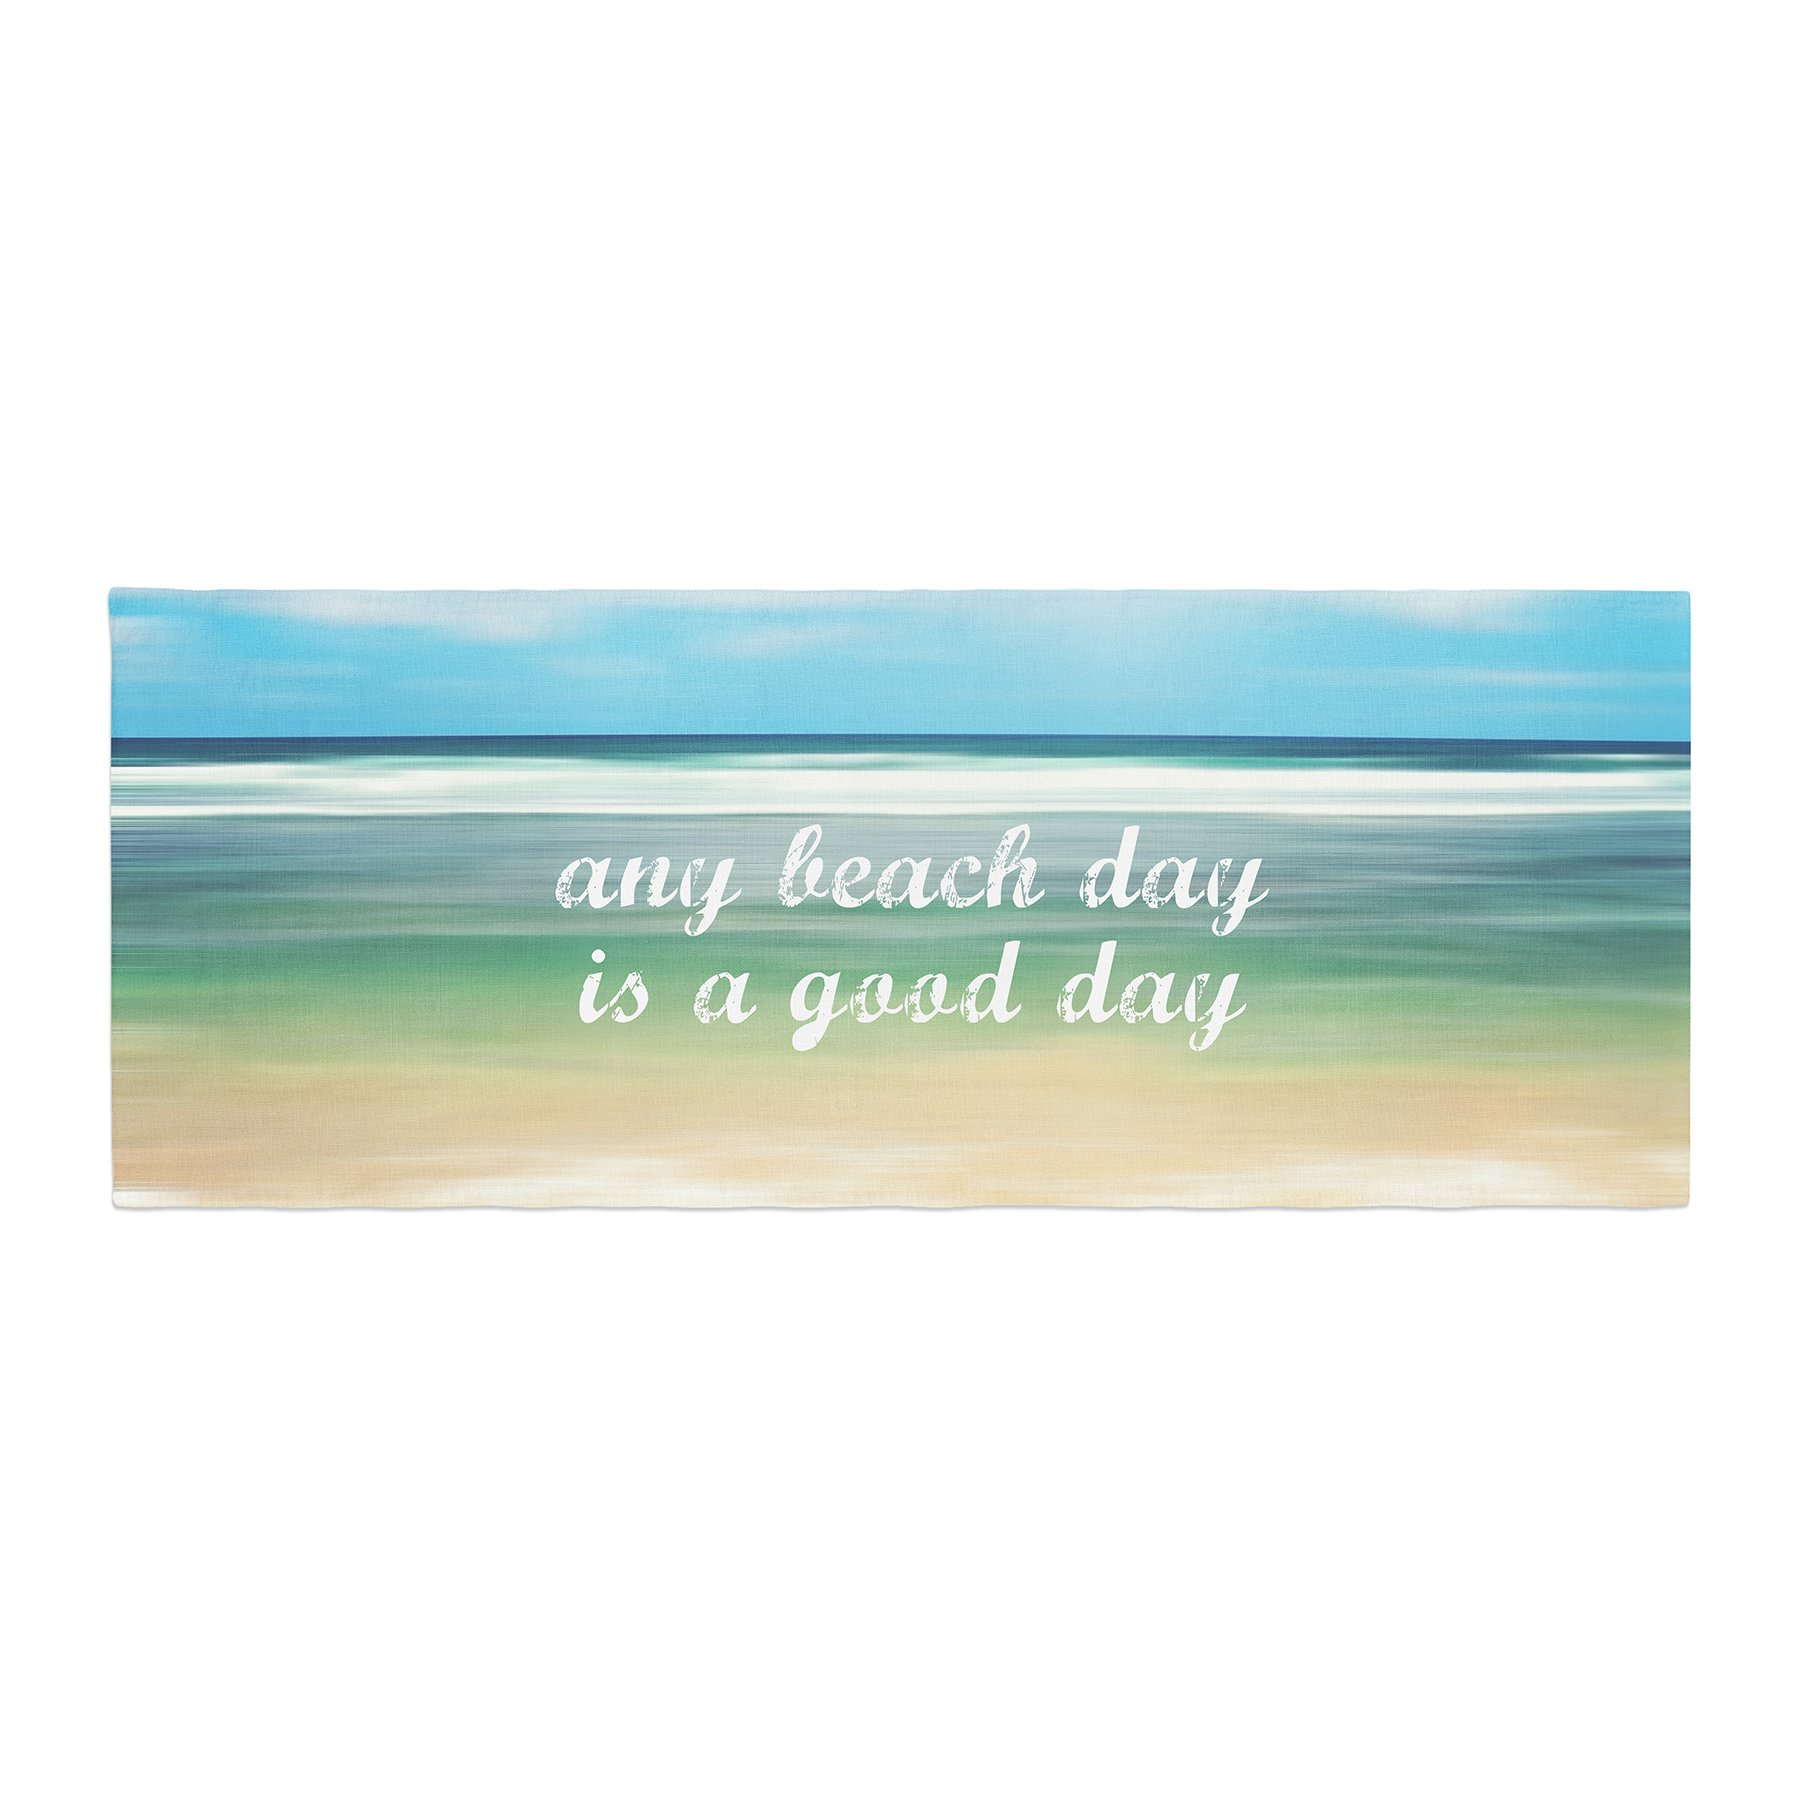 Kess InHouse Sylvia Cook Any Beach Day Coastal Typography Bed Runner, 34'' x 86''